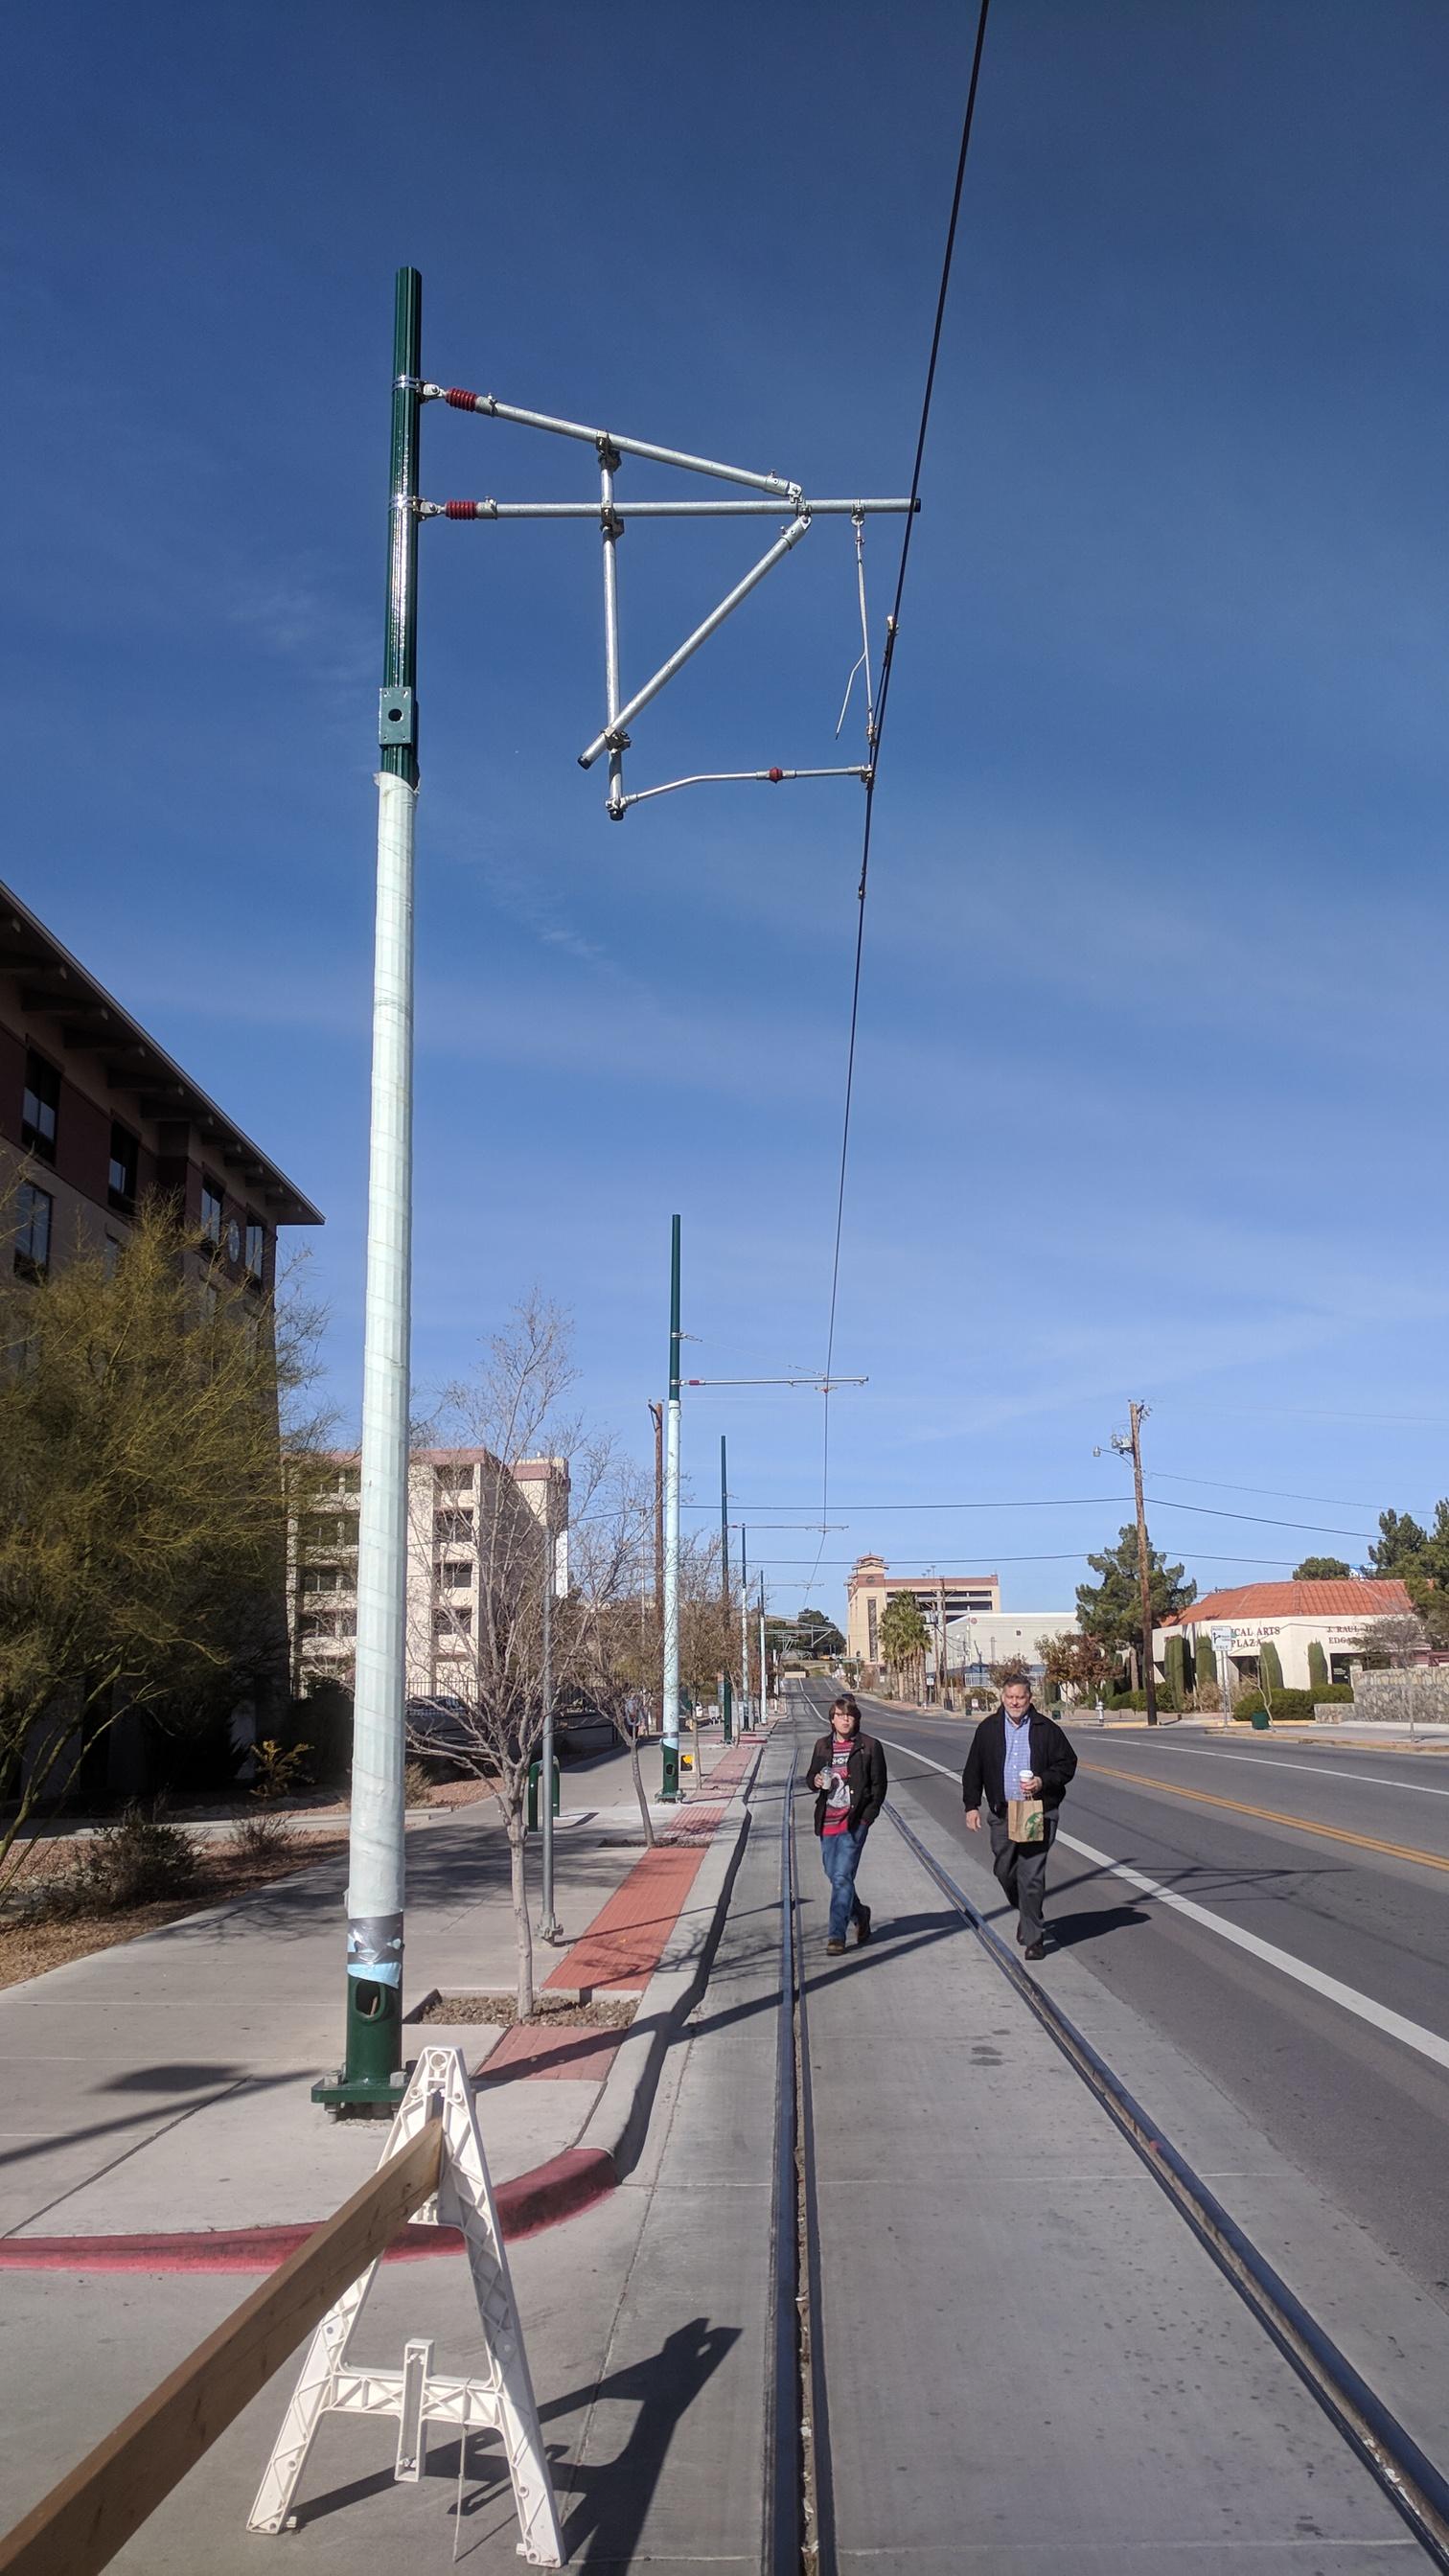 File:El Paso Streetcar wires.jpg - Wikimedia Commons